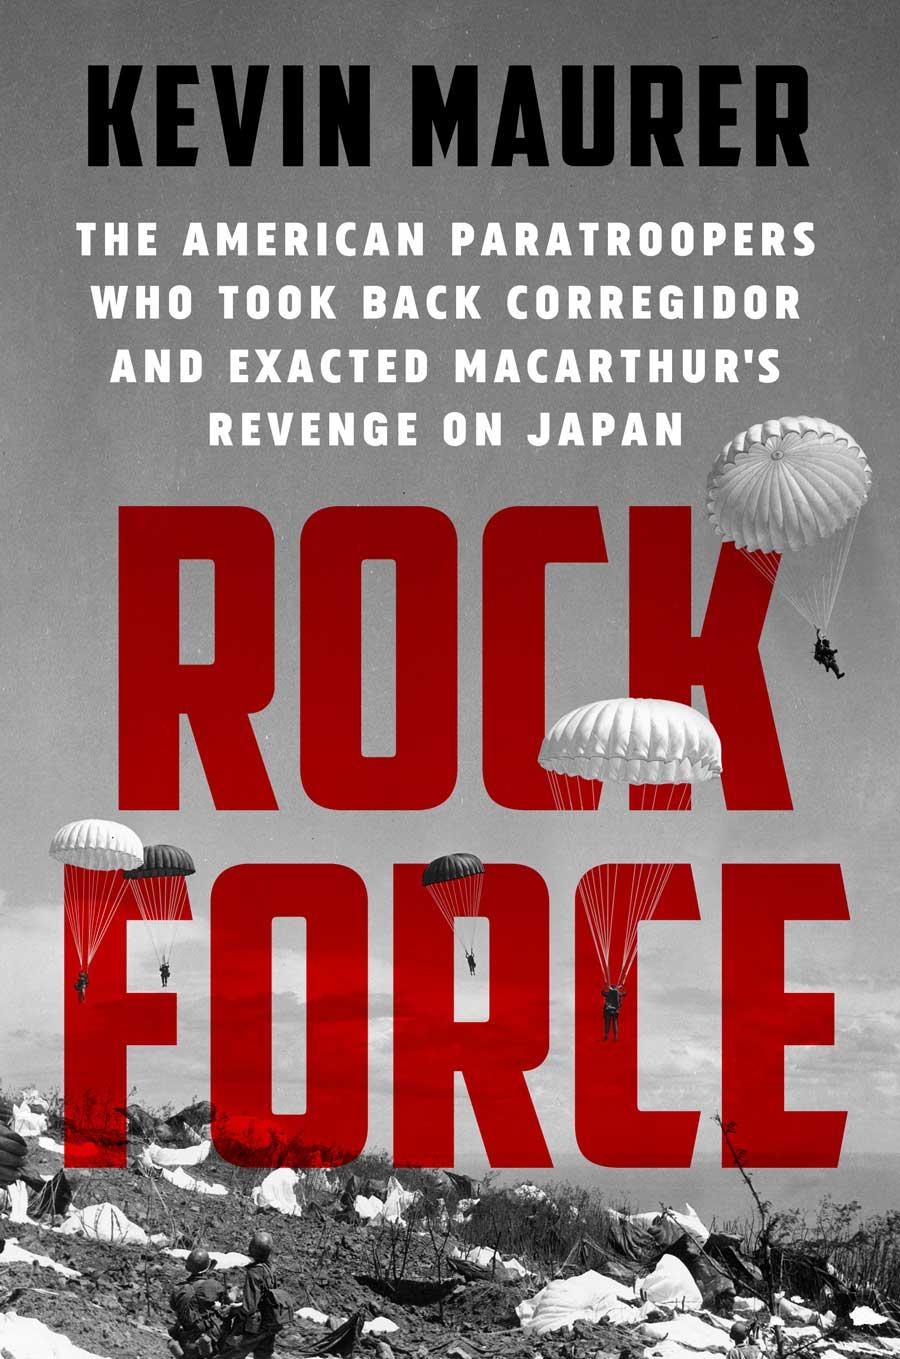 Rock Force, by Kevin Maurer, was released Dec. 1, 2020.